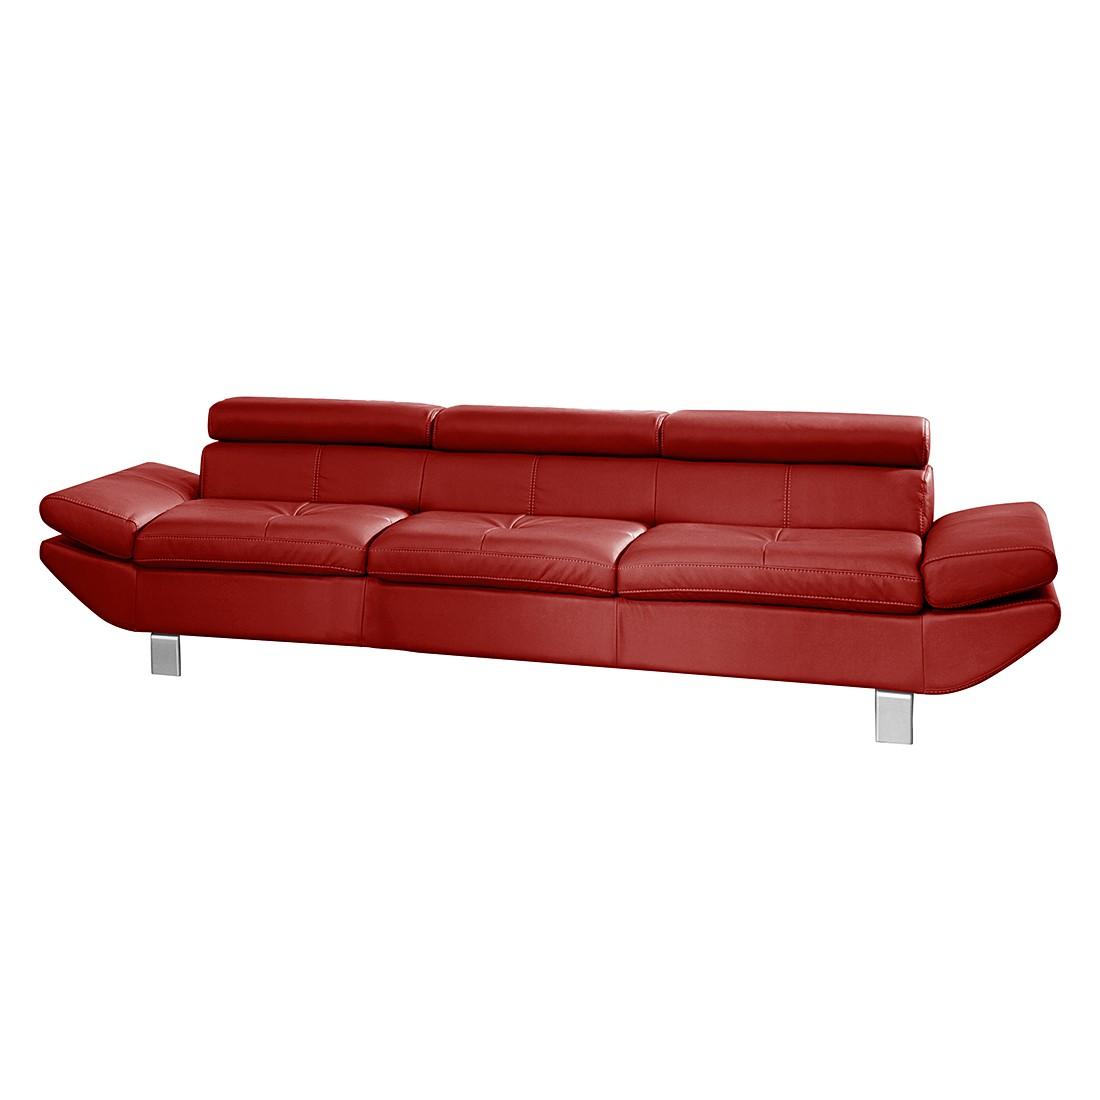 Sofa Fries (3-Sitzer) – Kunstleder Rot, Cotta jetzt bestellen